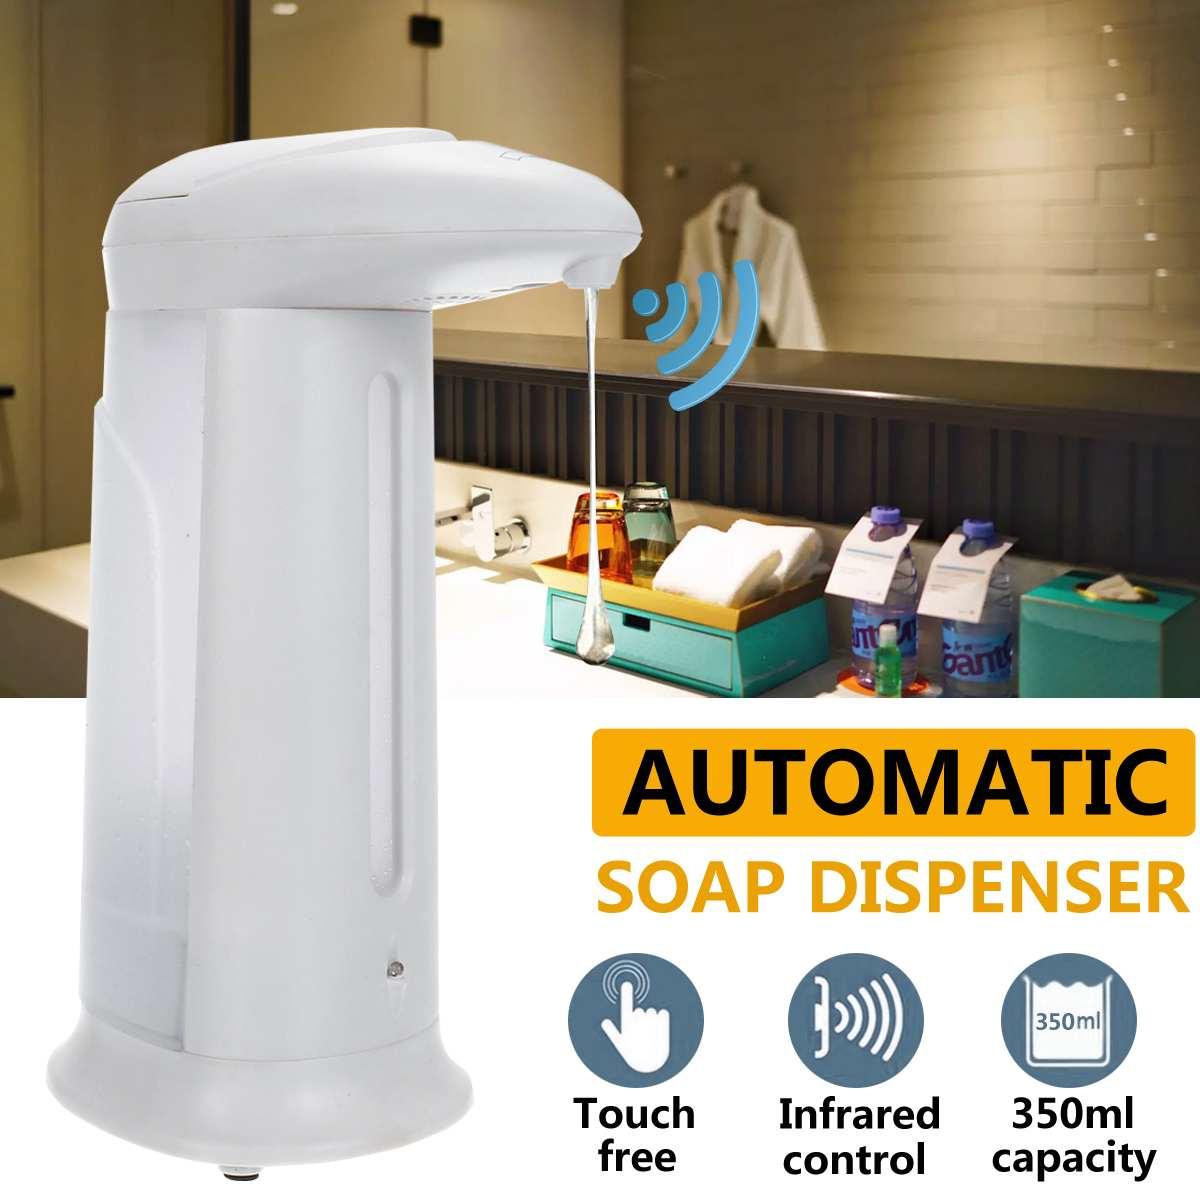 Automatic Liquid Soap Dispenser Hand Free Touchless 350ML Smart Sensor Soap Bottle Dispenser Pump Shower For Bathroom Kitchen